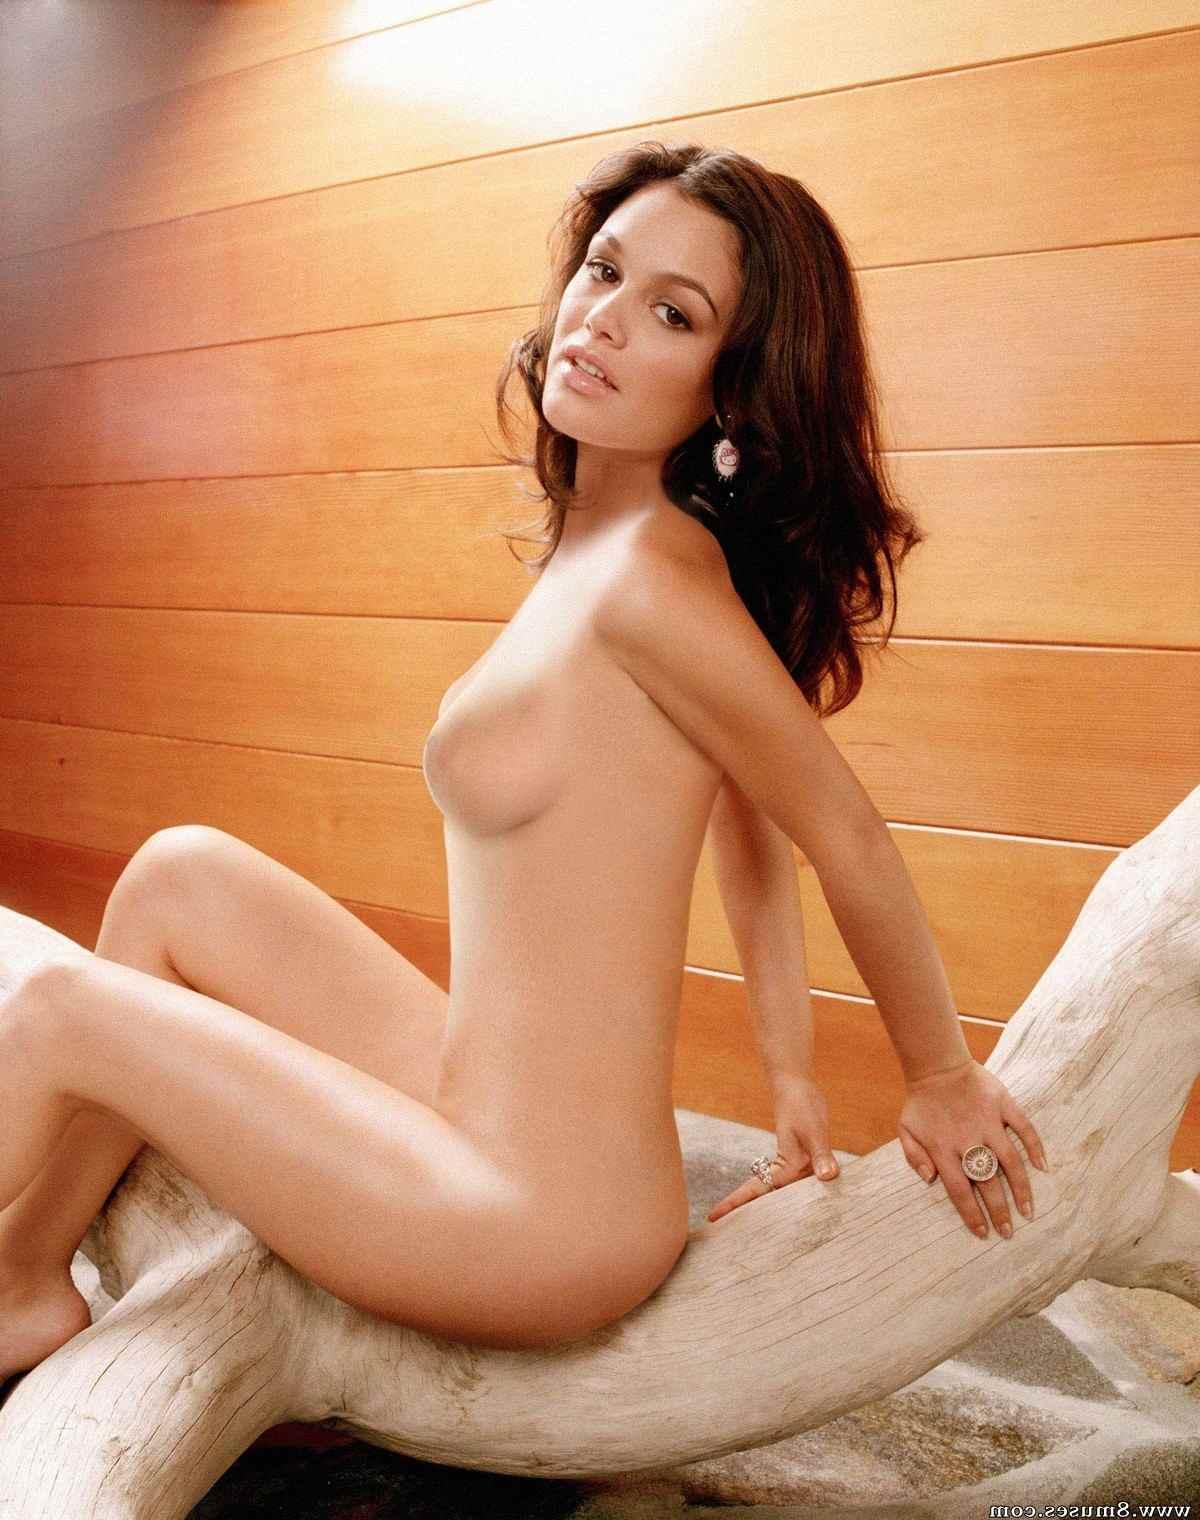 Fake-Celebrities-Sex-Pictures/Rachel-Bilson Rachel_Bilson__8muses_-_Sex_and_Porn_Comics_10.jpg